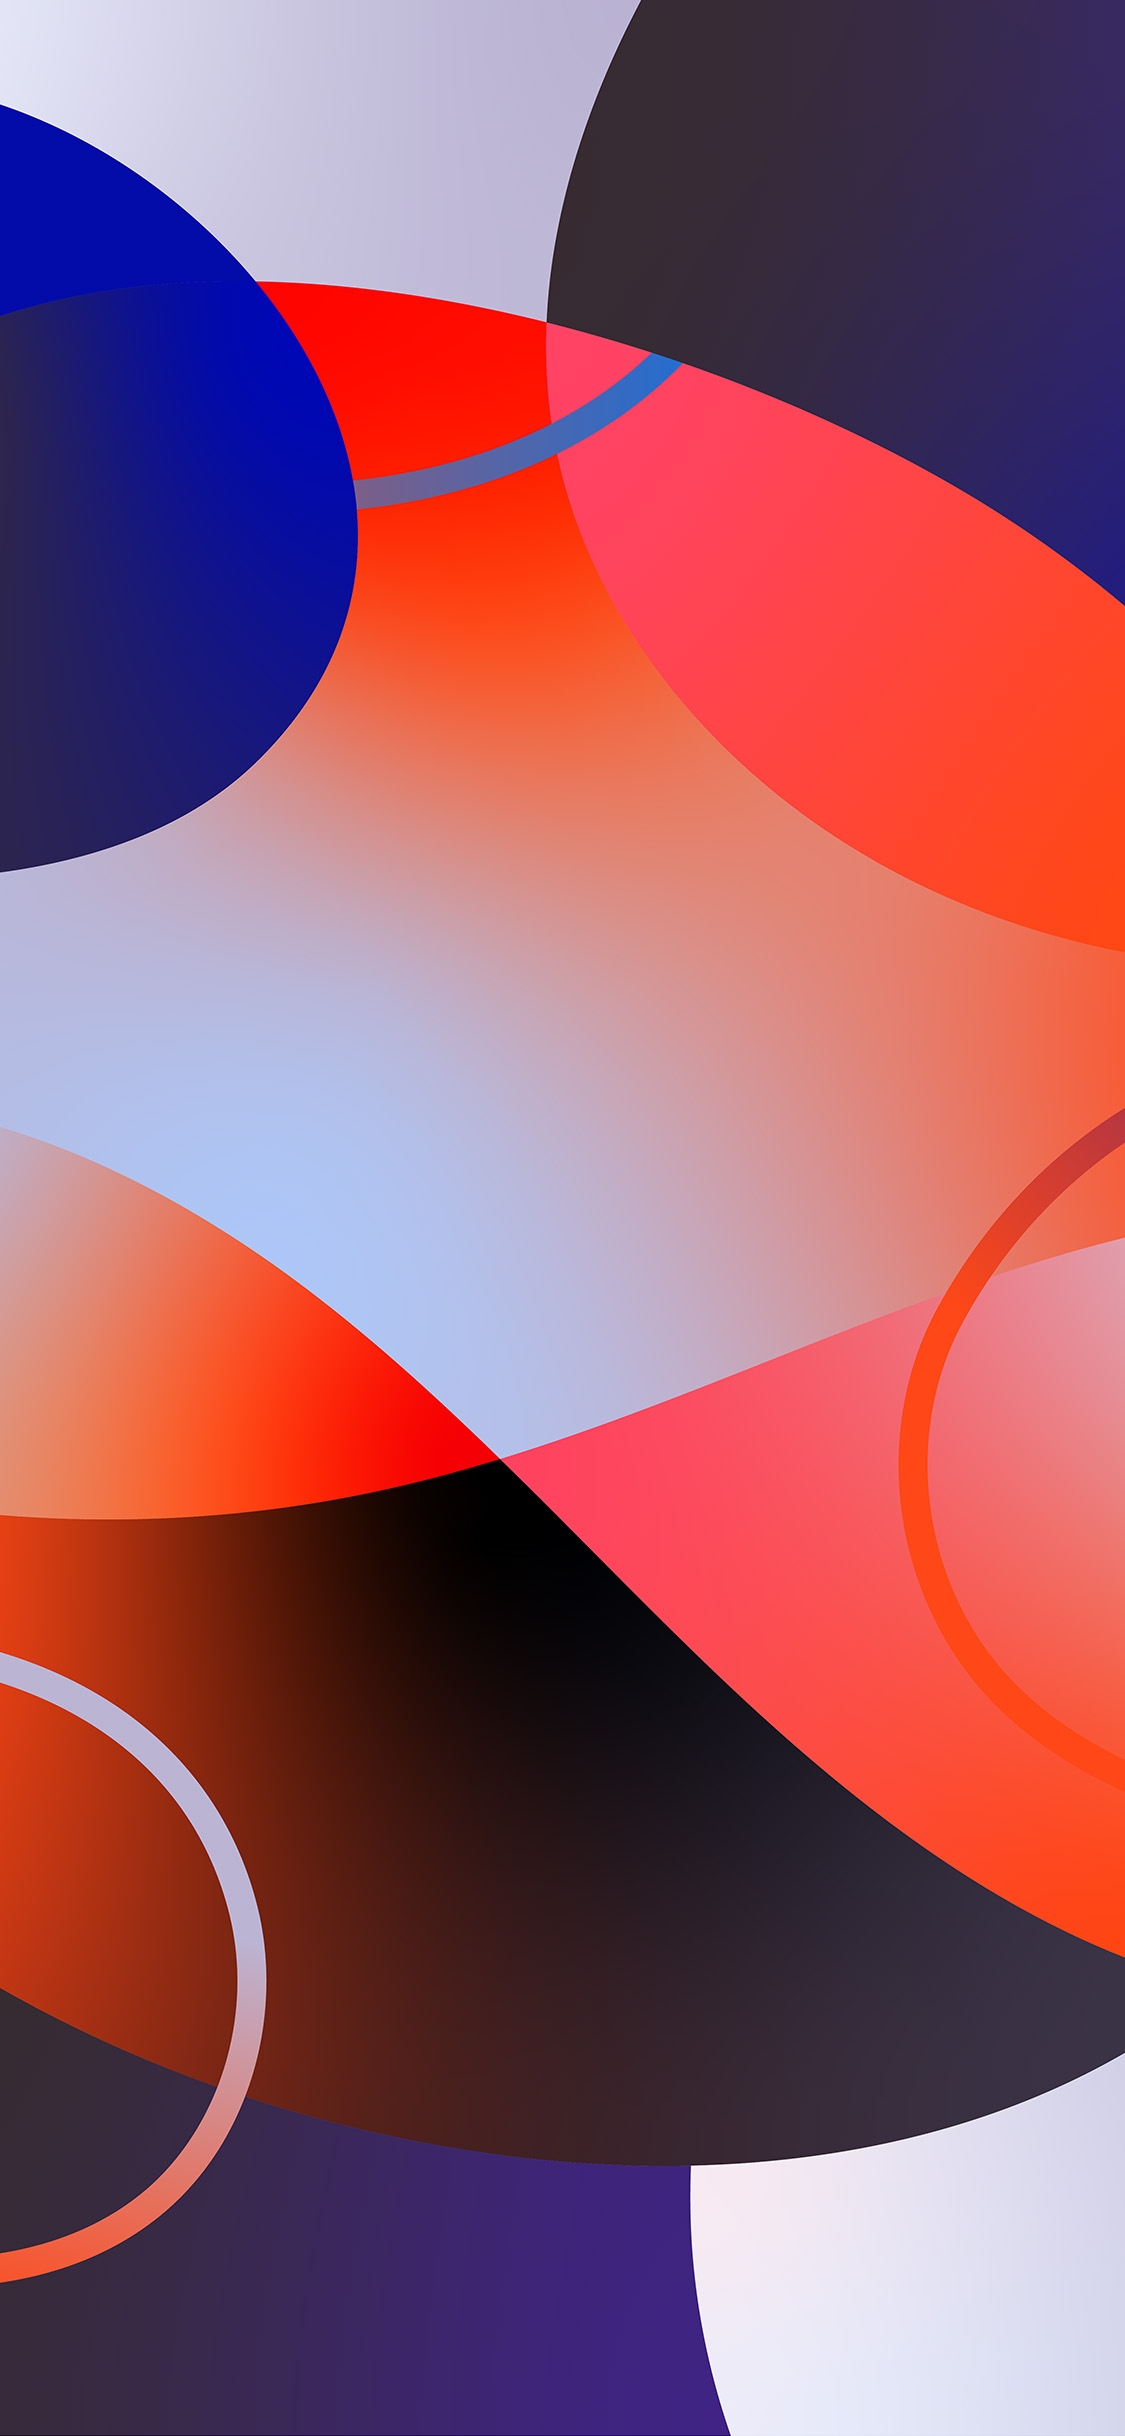 Wallpaper-018